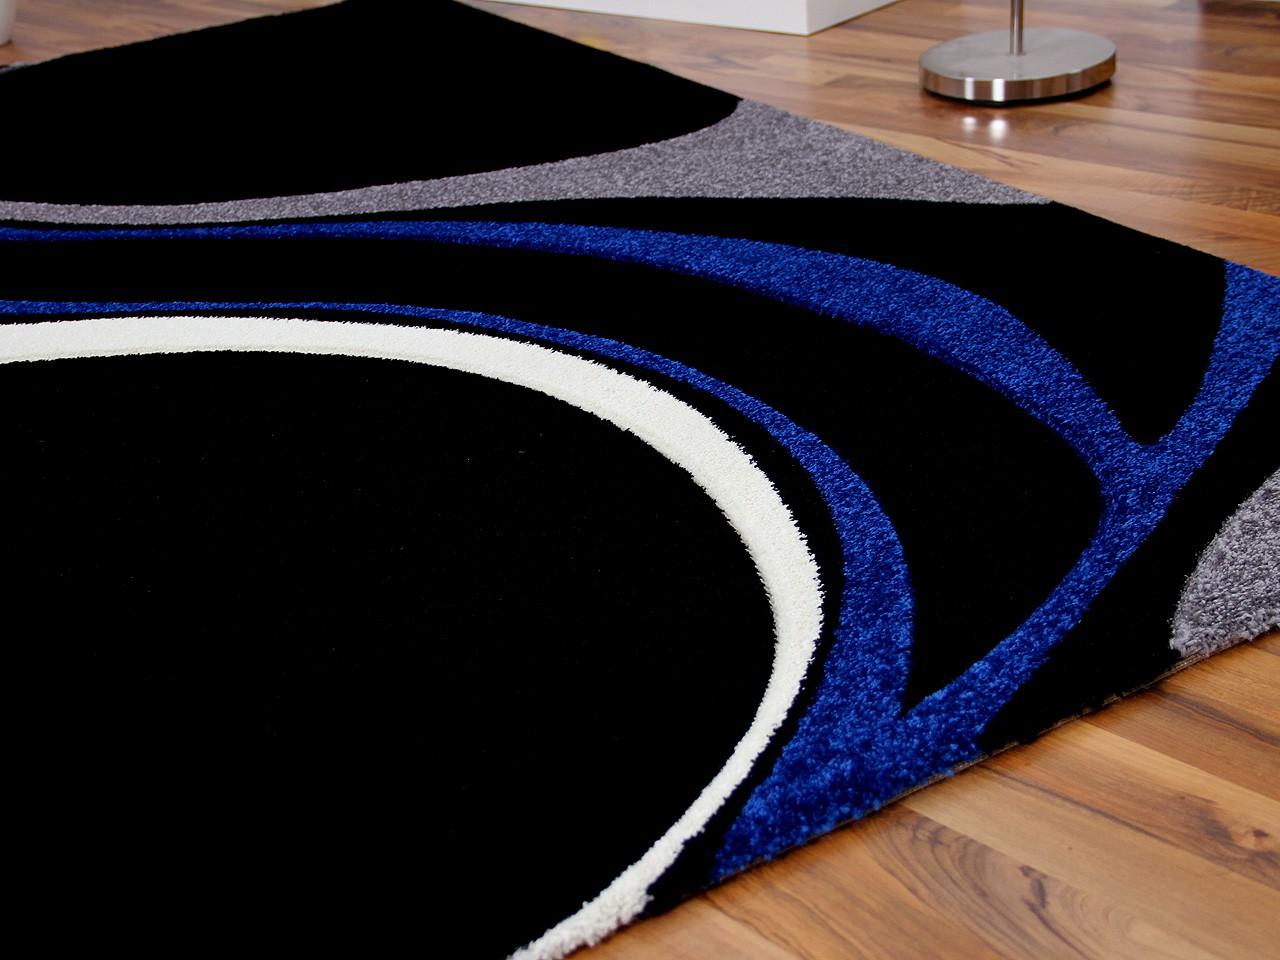 designer teppich maui schwarz blau style teppiche. Black Bedroom Furniture Sets. Home Design Ideas